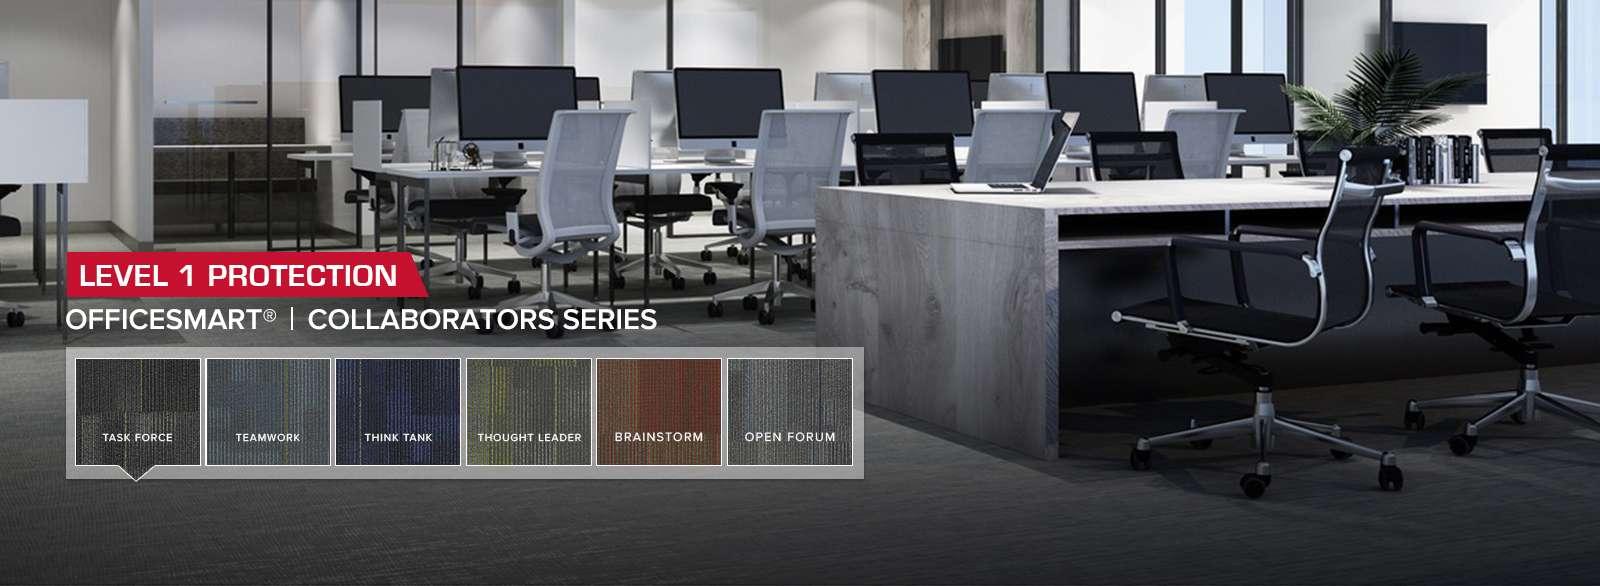 ESD Carpet Tile OfficeSmart Collaborators Series